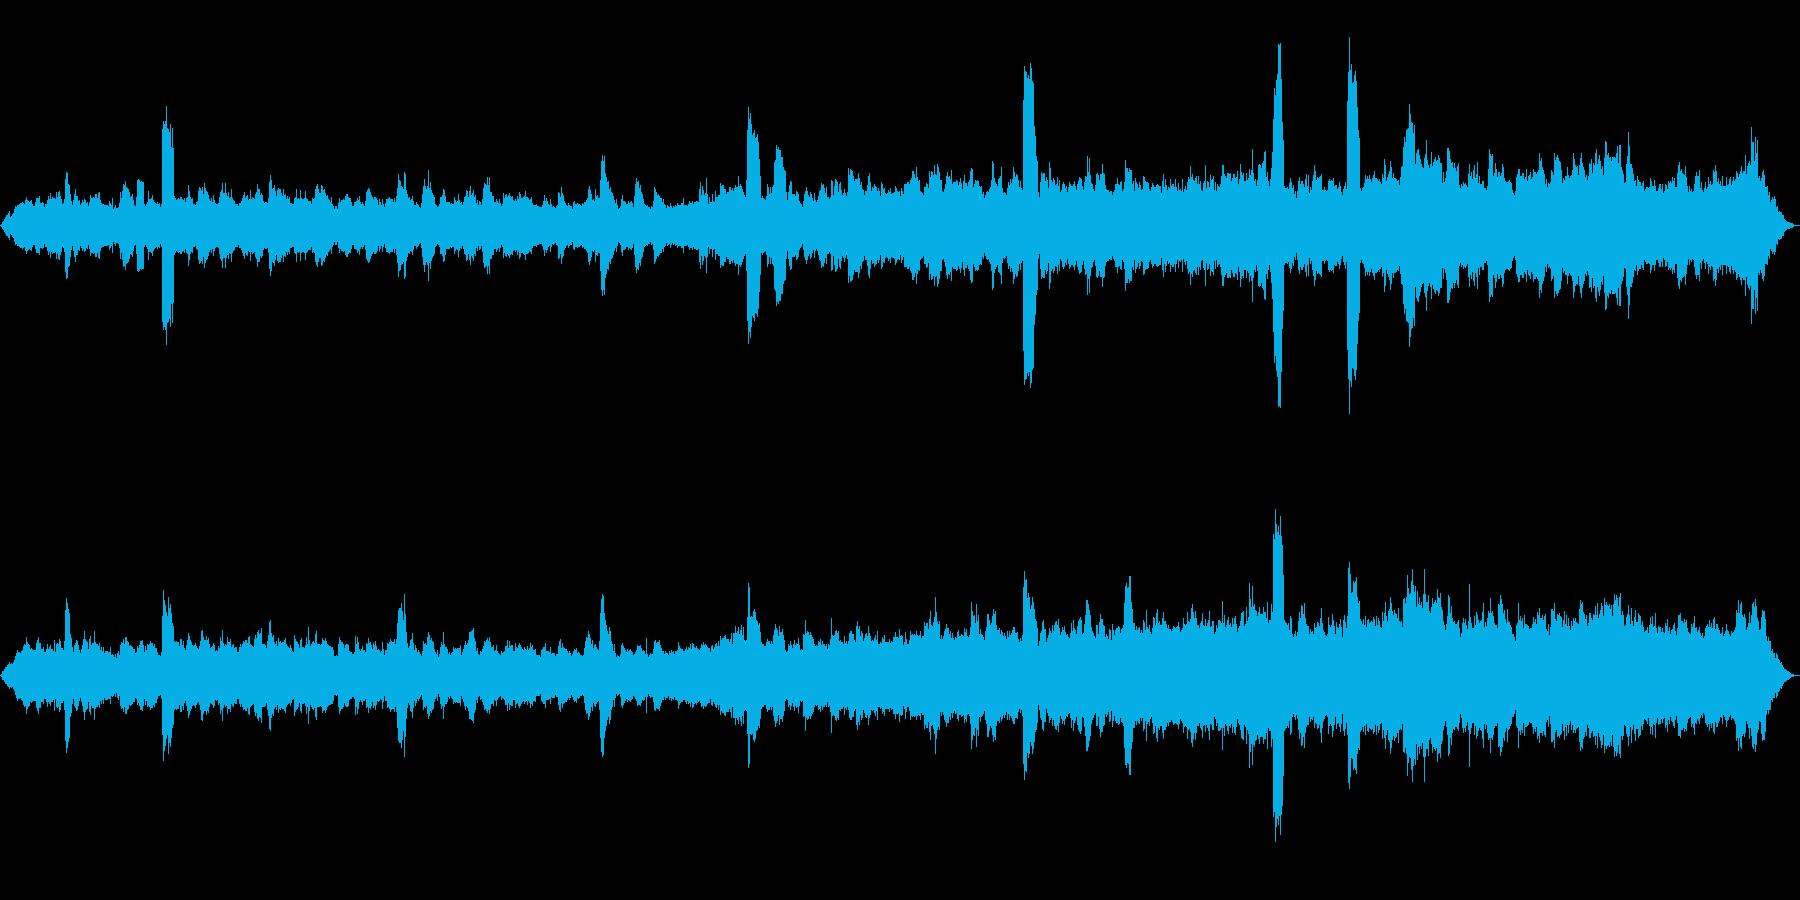 [ASMR]昆虫などが鳴いている森_01の再生済みの波形